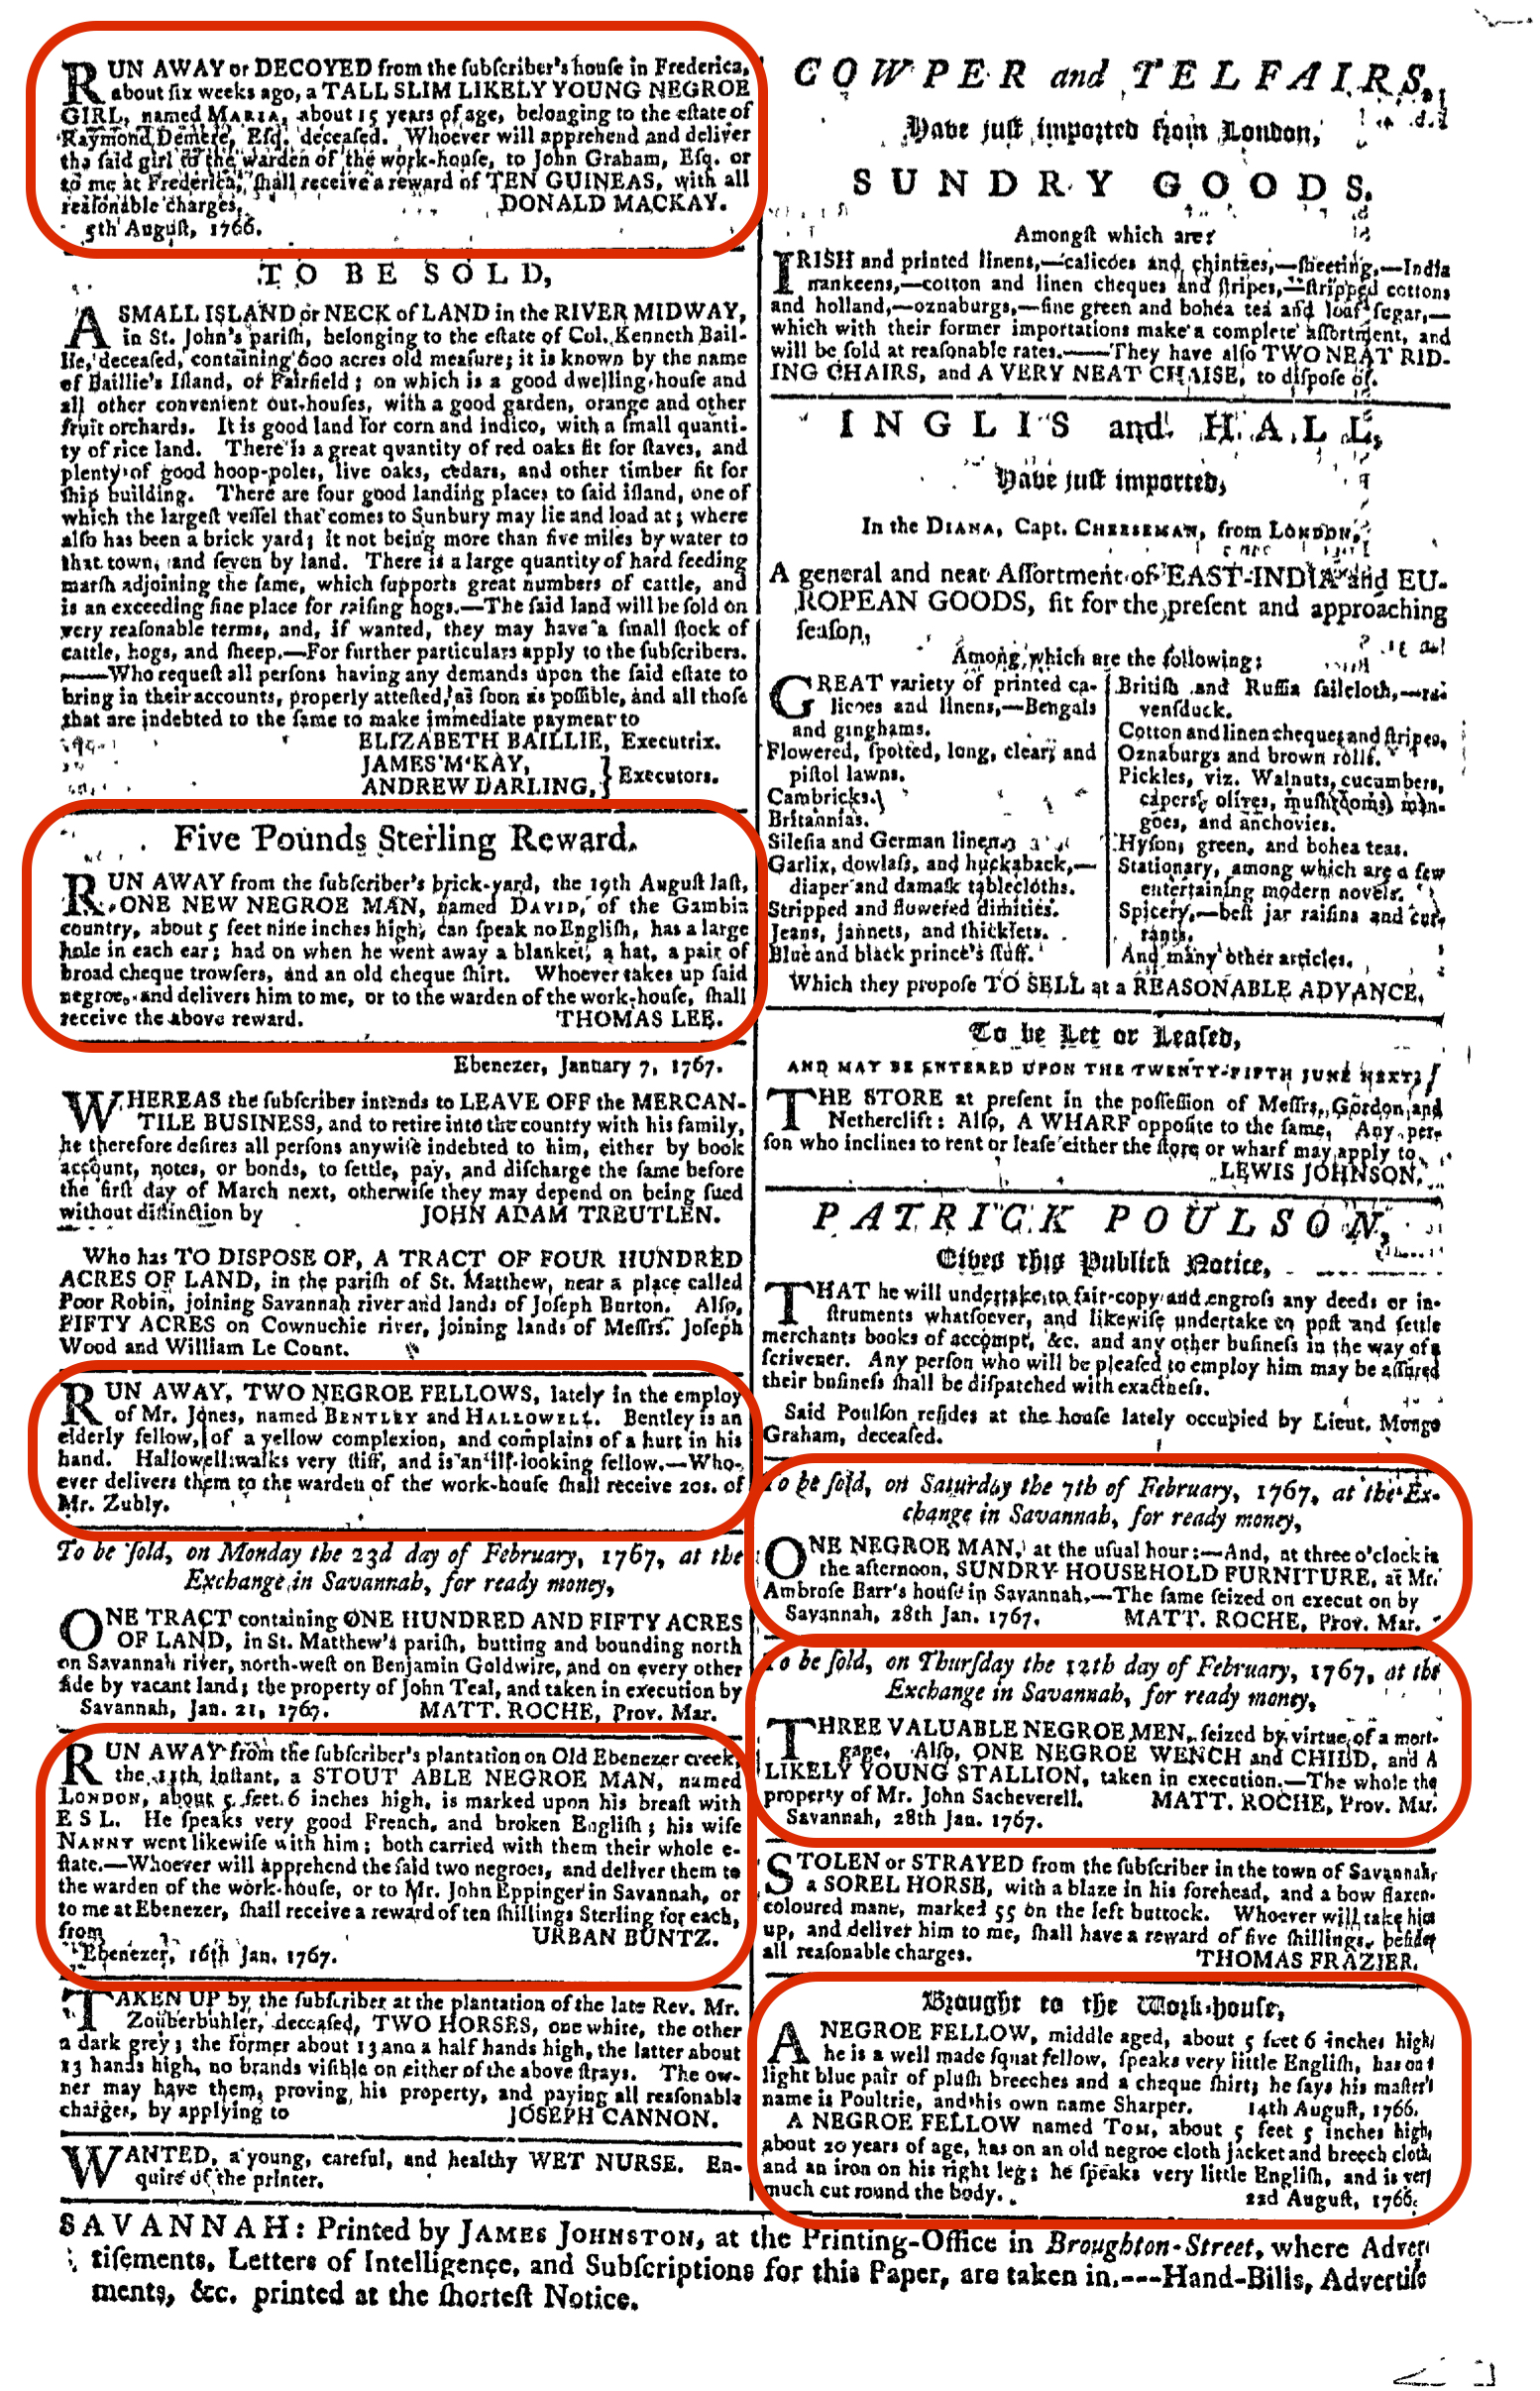 feb-4-georgia-gazette